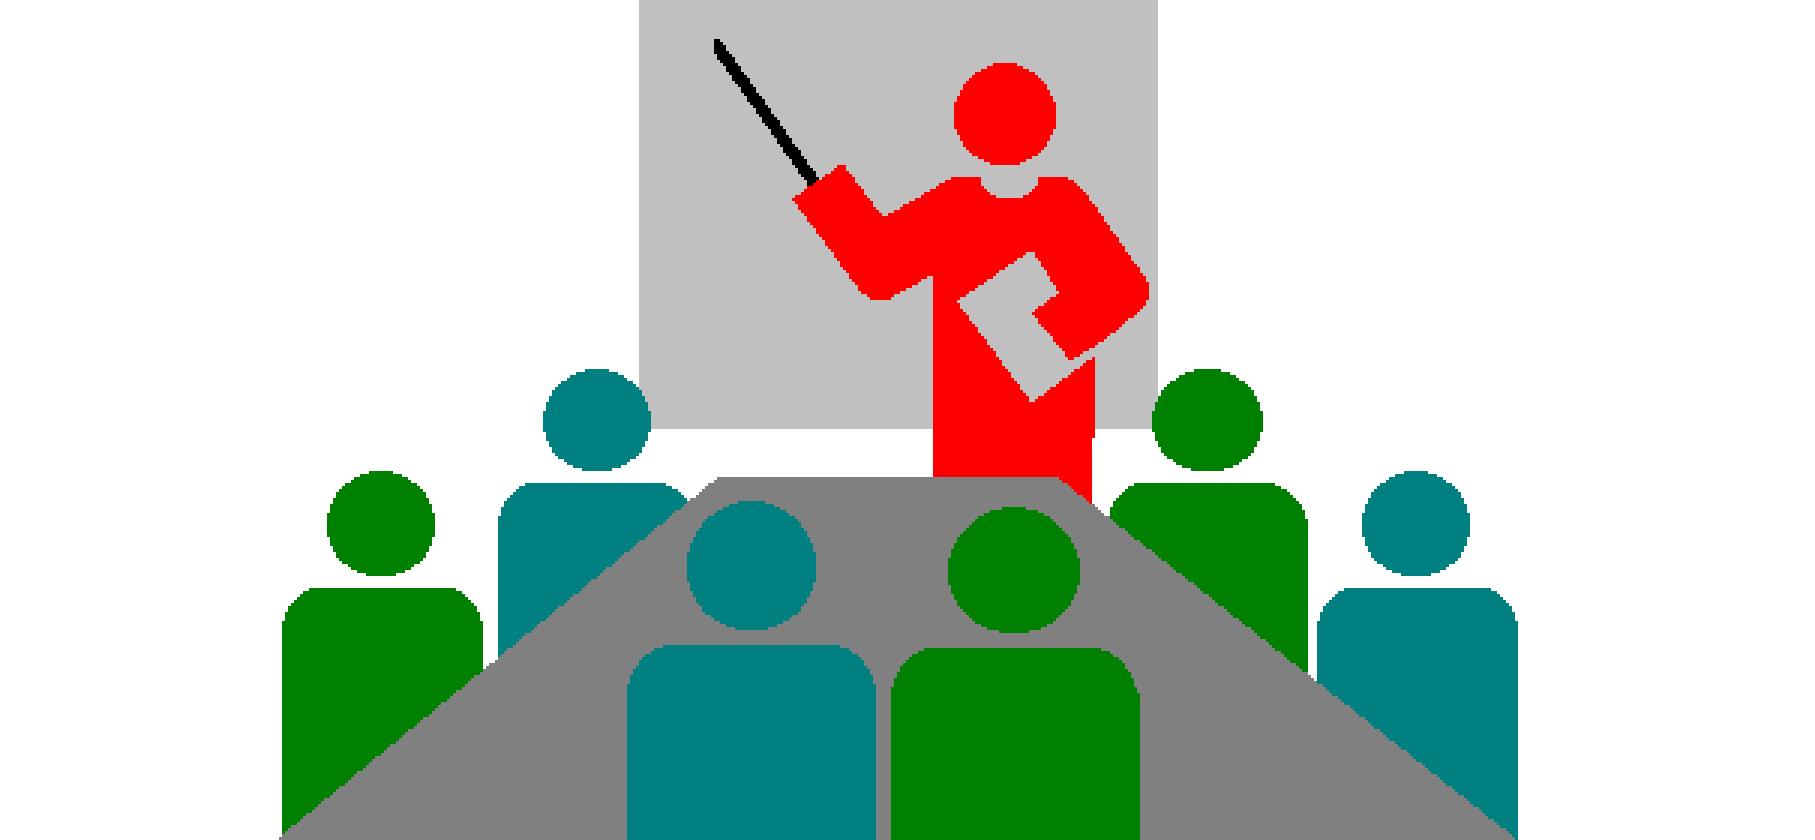 Meeting clipart workshop Seminar Meeting clipart Cliparts Zone